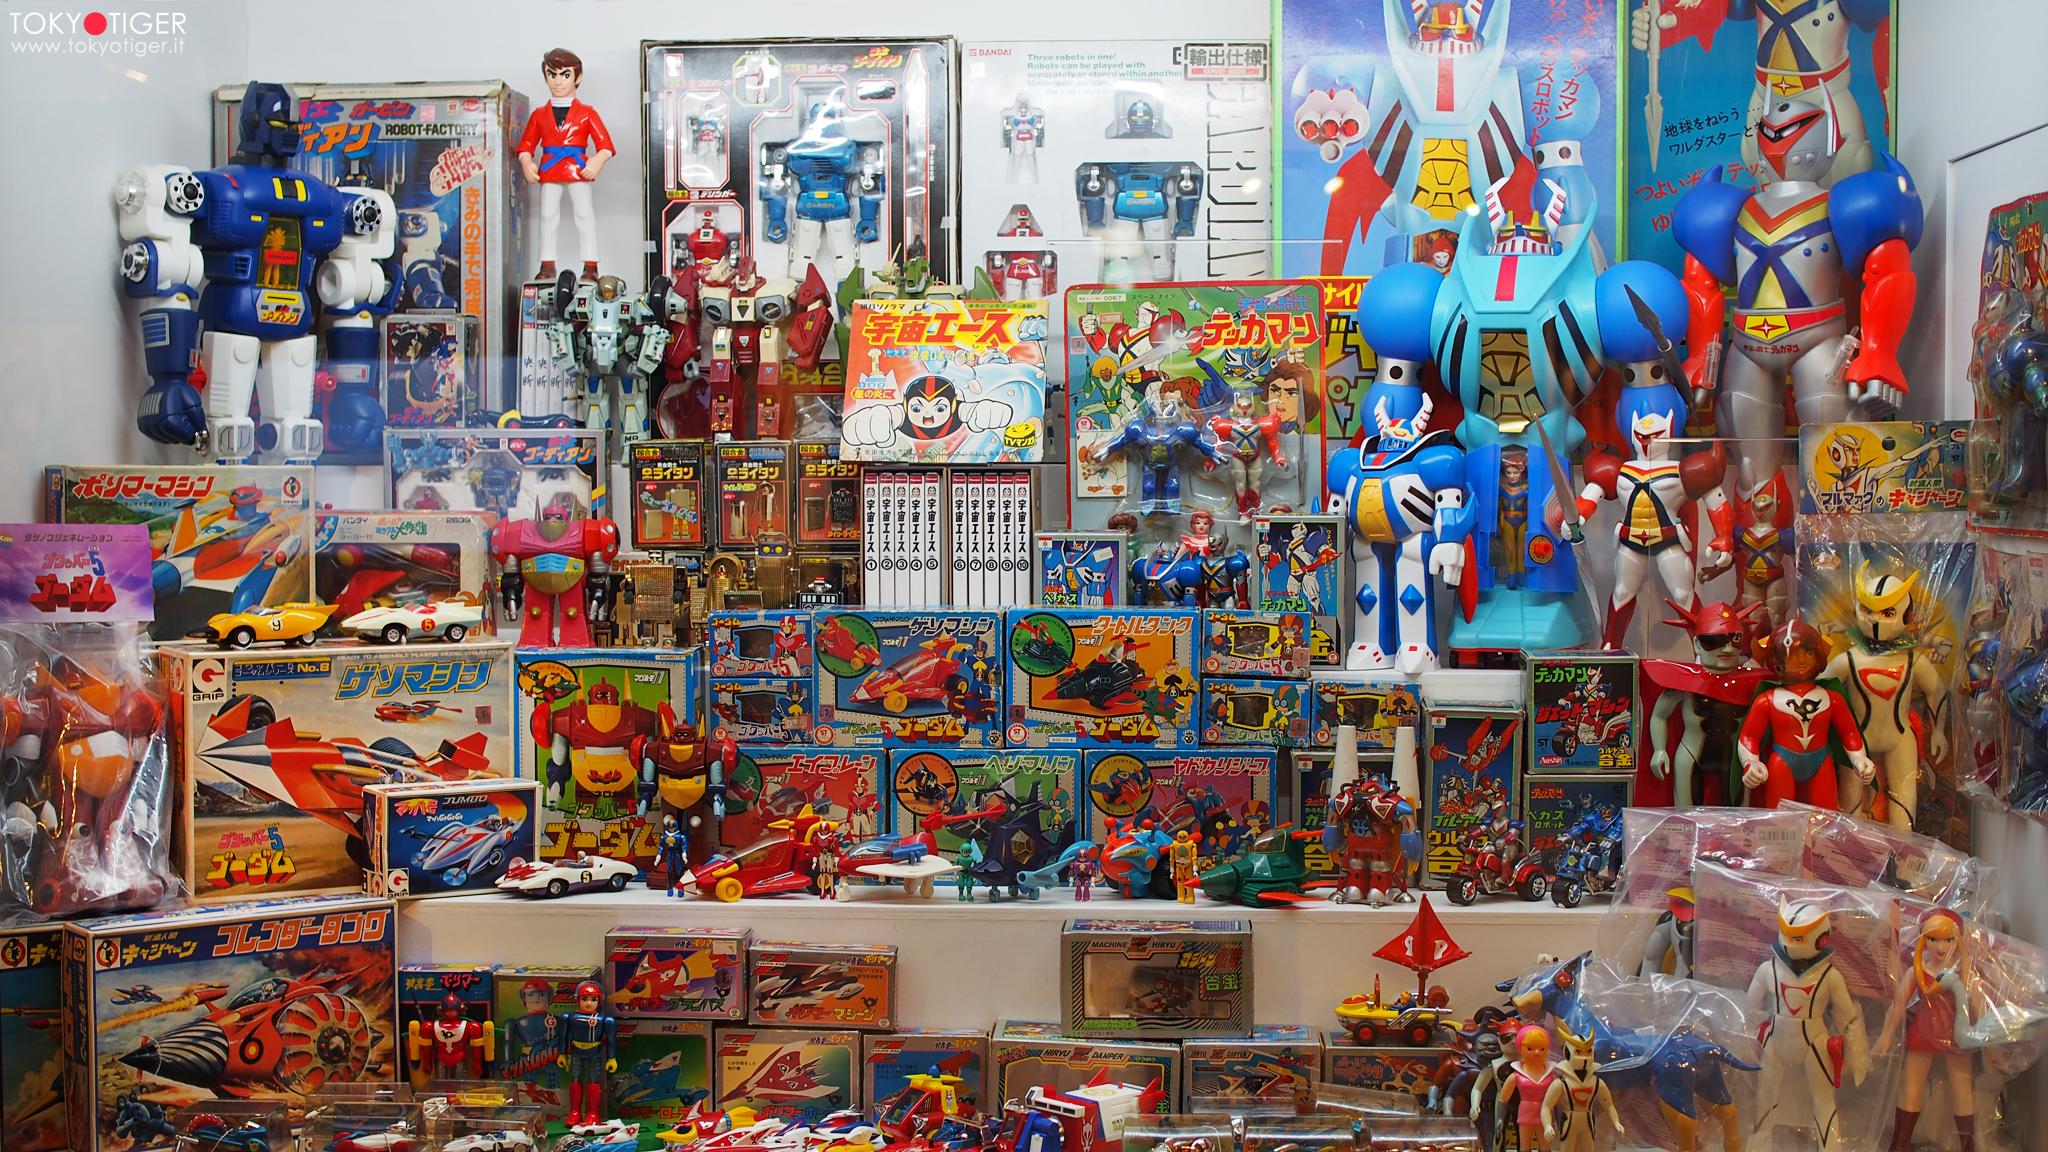 Go-nagai-devilman,mazinga,ufo-robot,goldrake,go-nagai-exhibition,tokyotiger,tatsunoko,yattaman,dokrobei,tandem,only-in-japan